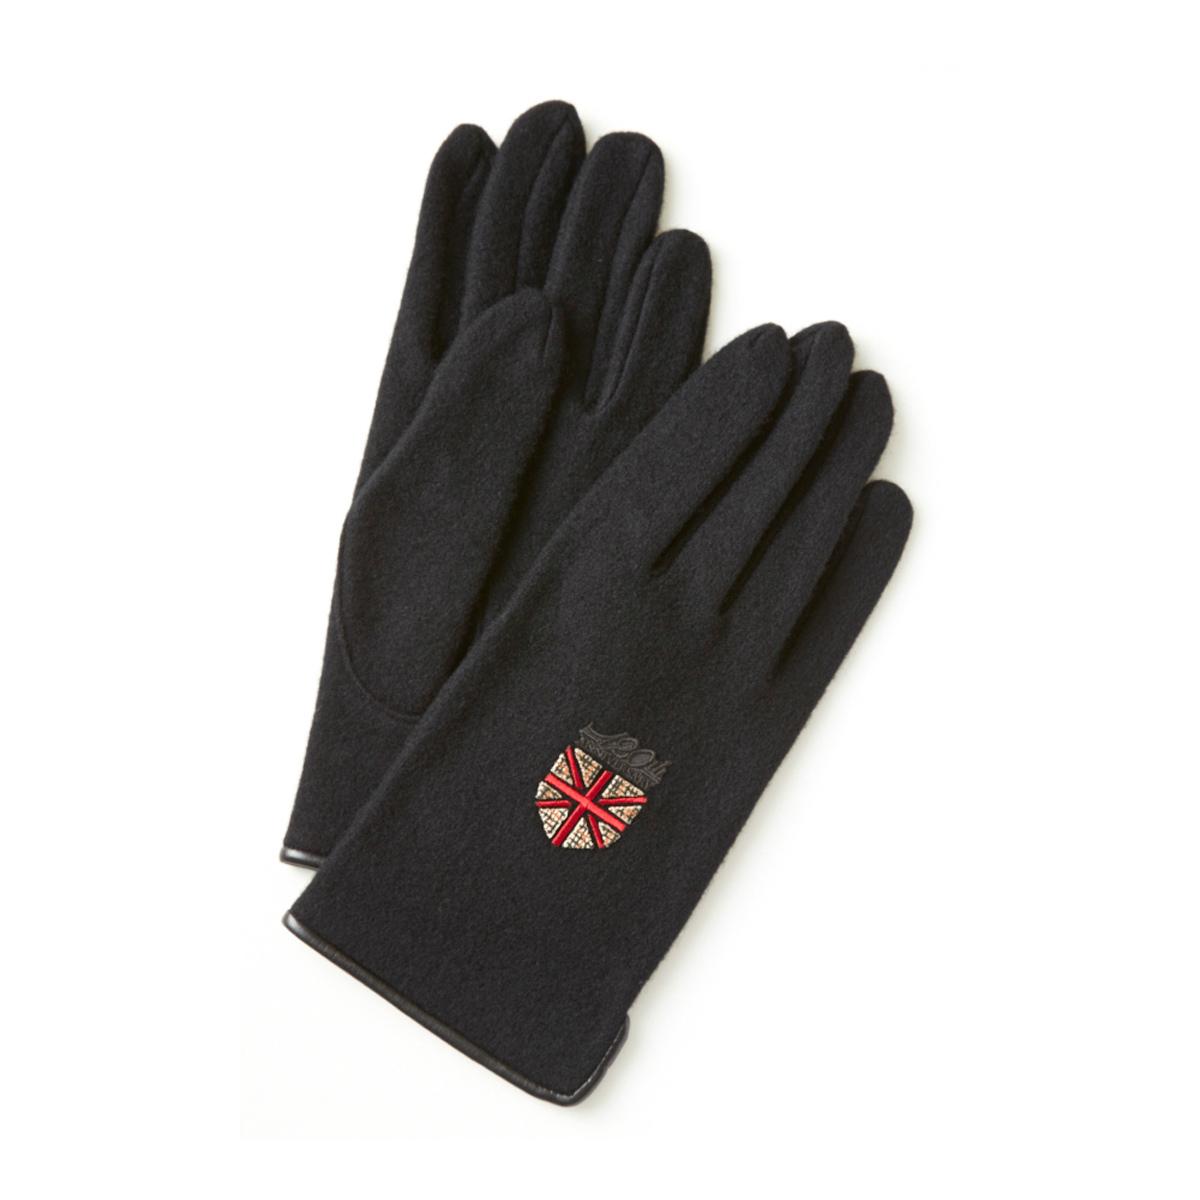 DAKS ウール混ジャージ メンズ手袋 ユニオンジャックワッペン 23〜24cm(M) 全4色